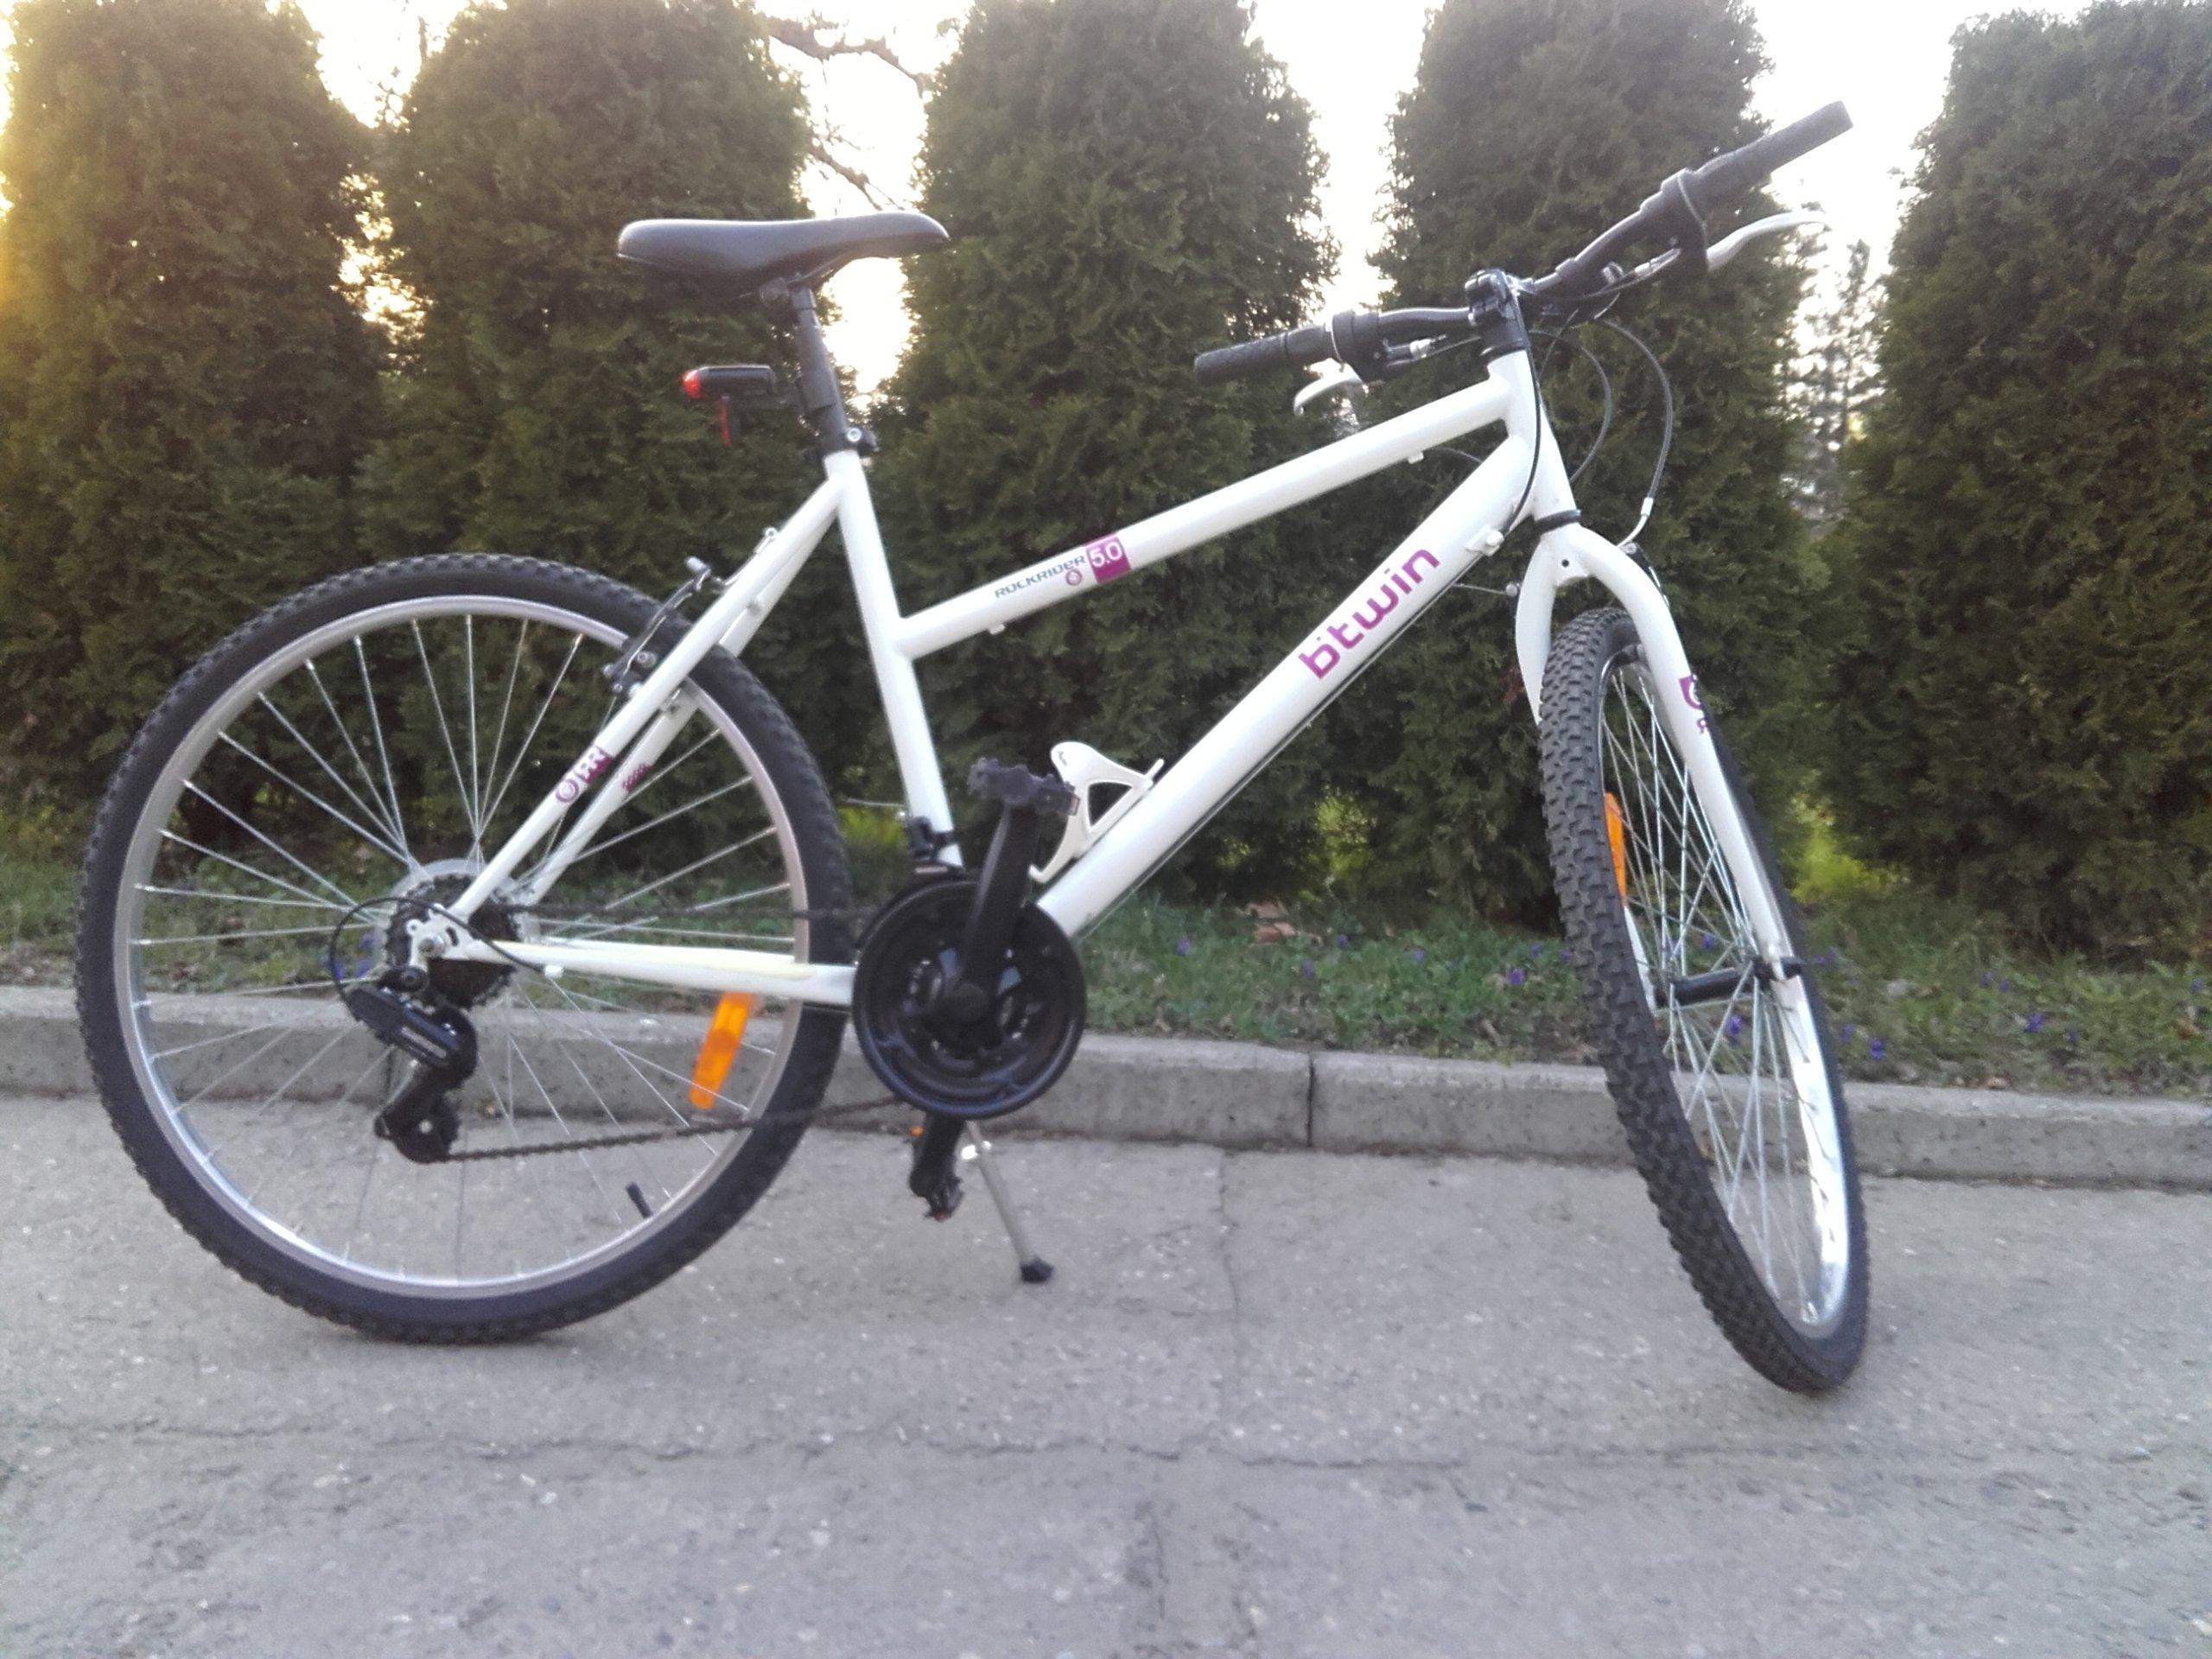 b5f1e66e1 rockrider rowery w Oficjalnym Archiwum Allegro - Strona 15 - archiwum ofert